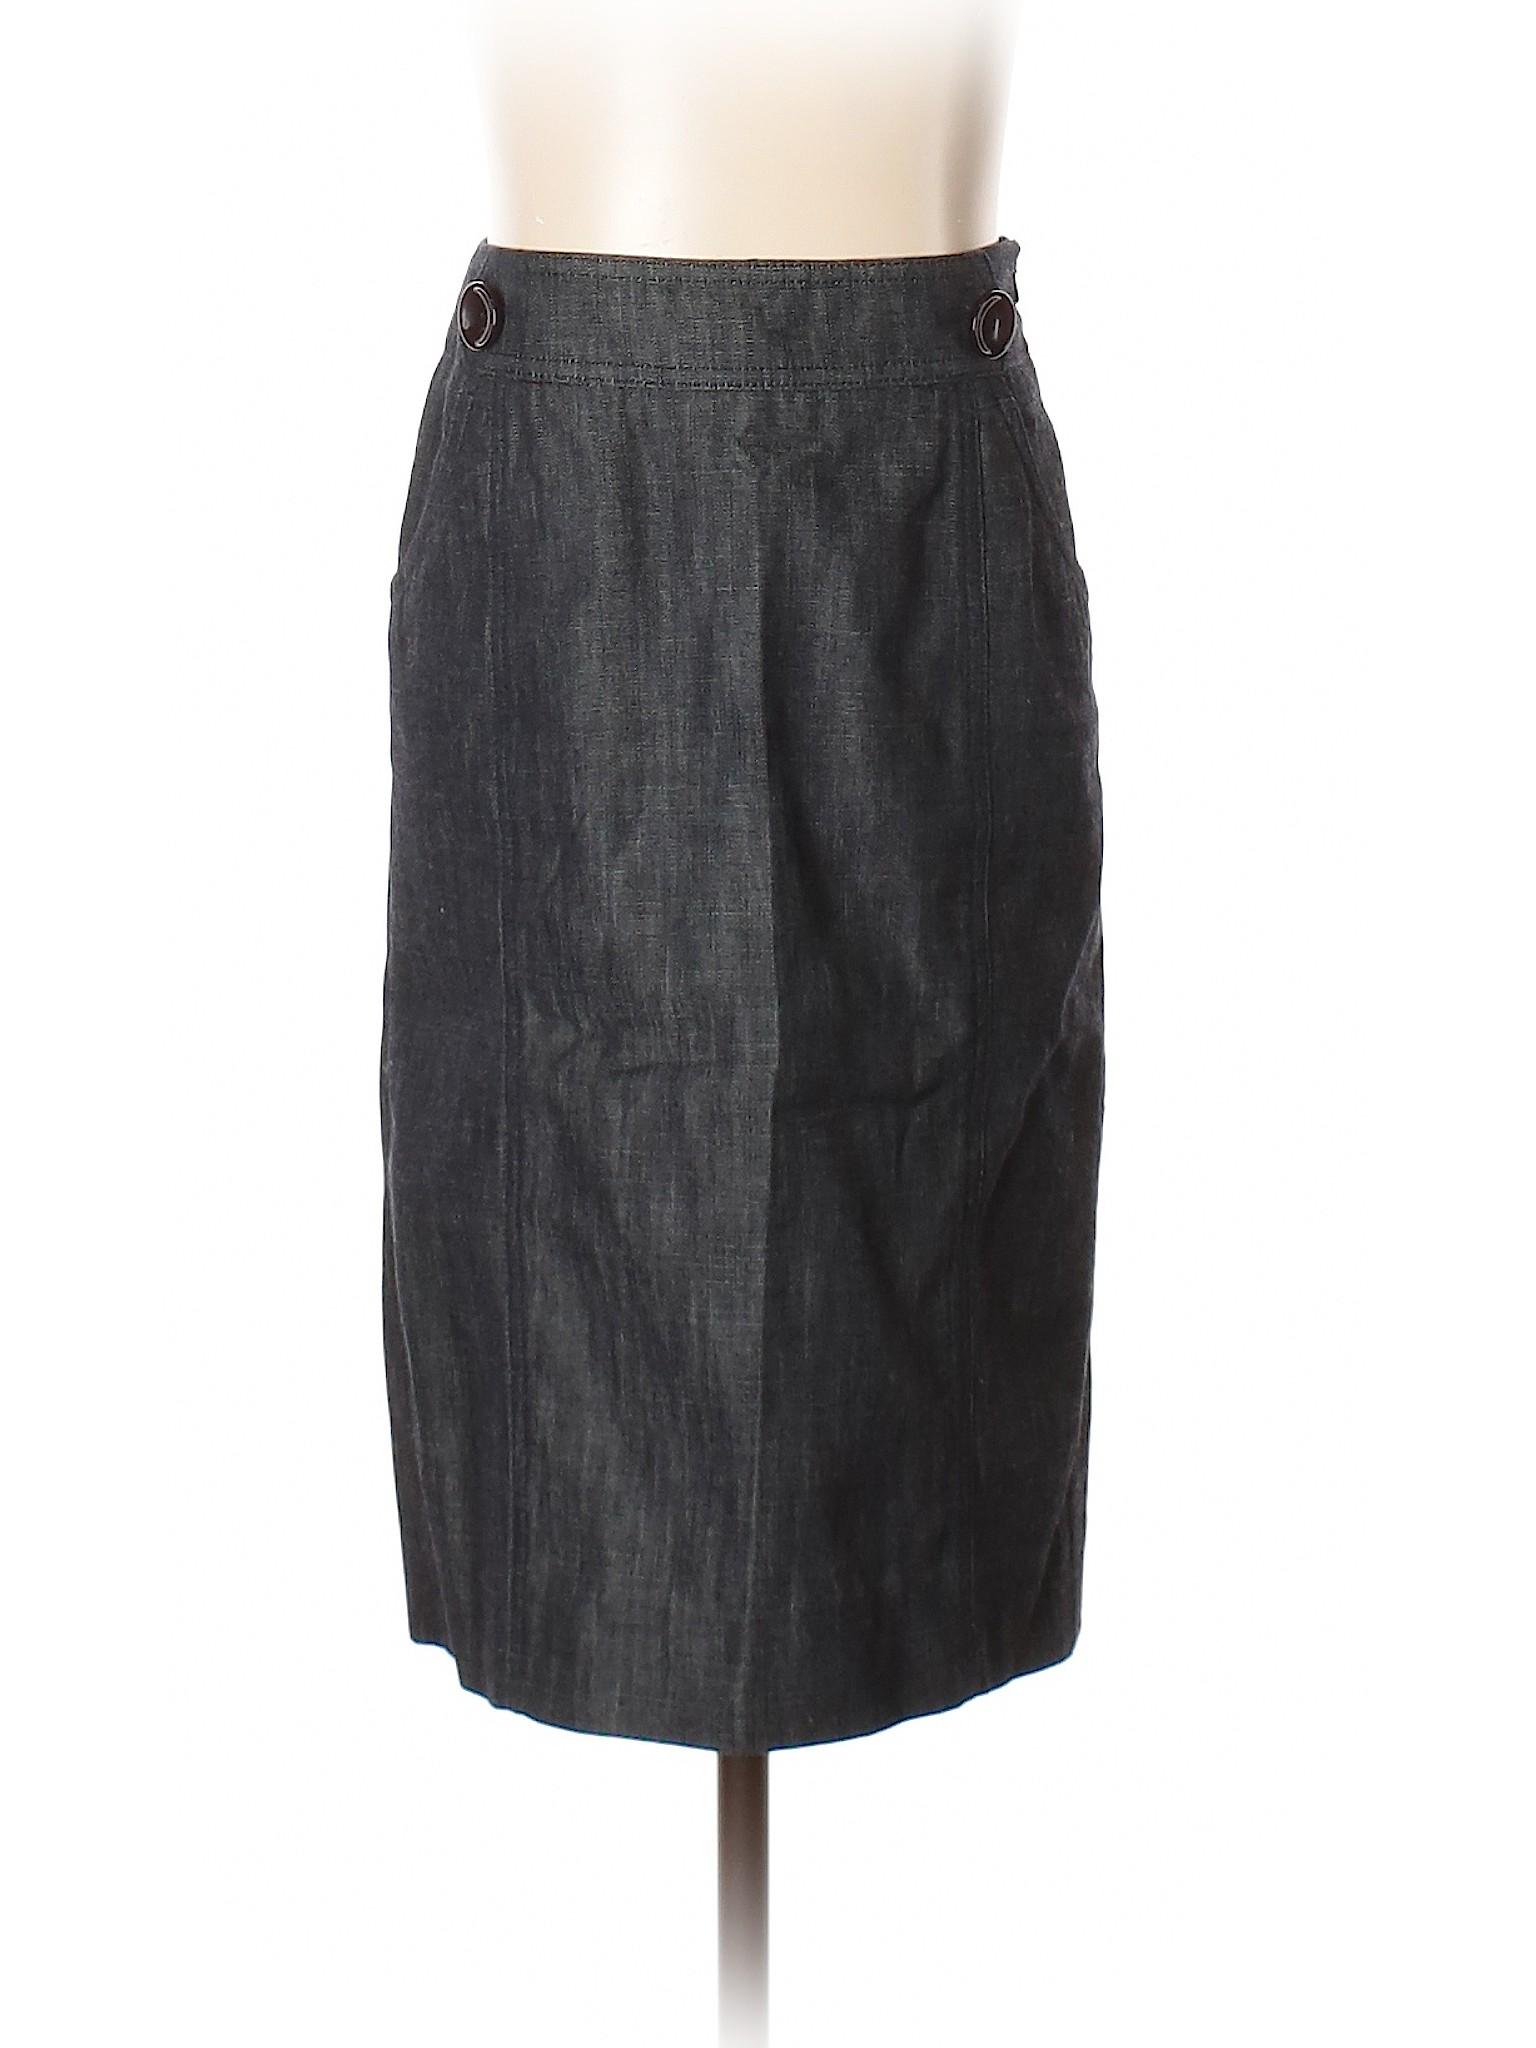 Skirt Skirt Skirt Boutique Boutique Denim Denim Denim Boutique Skirt Denim Denim Boutique Boutique Skirt C65nqRnxw